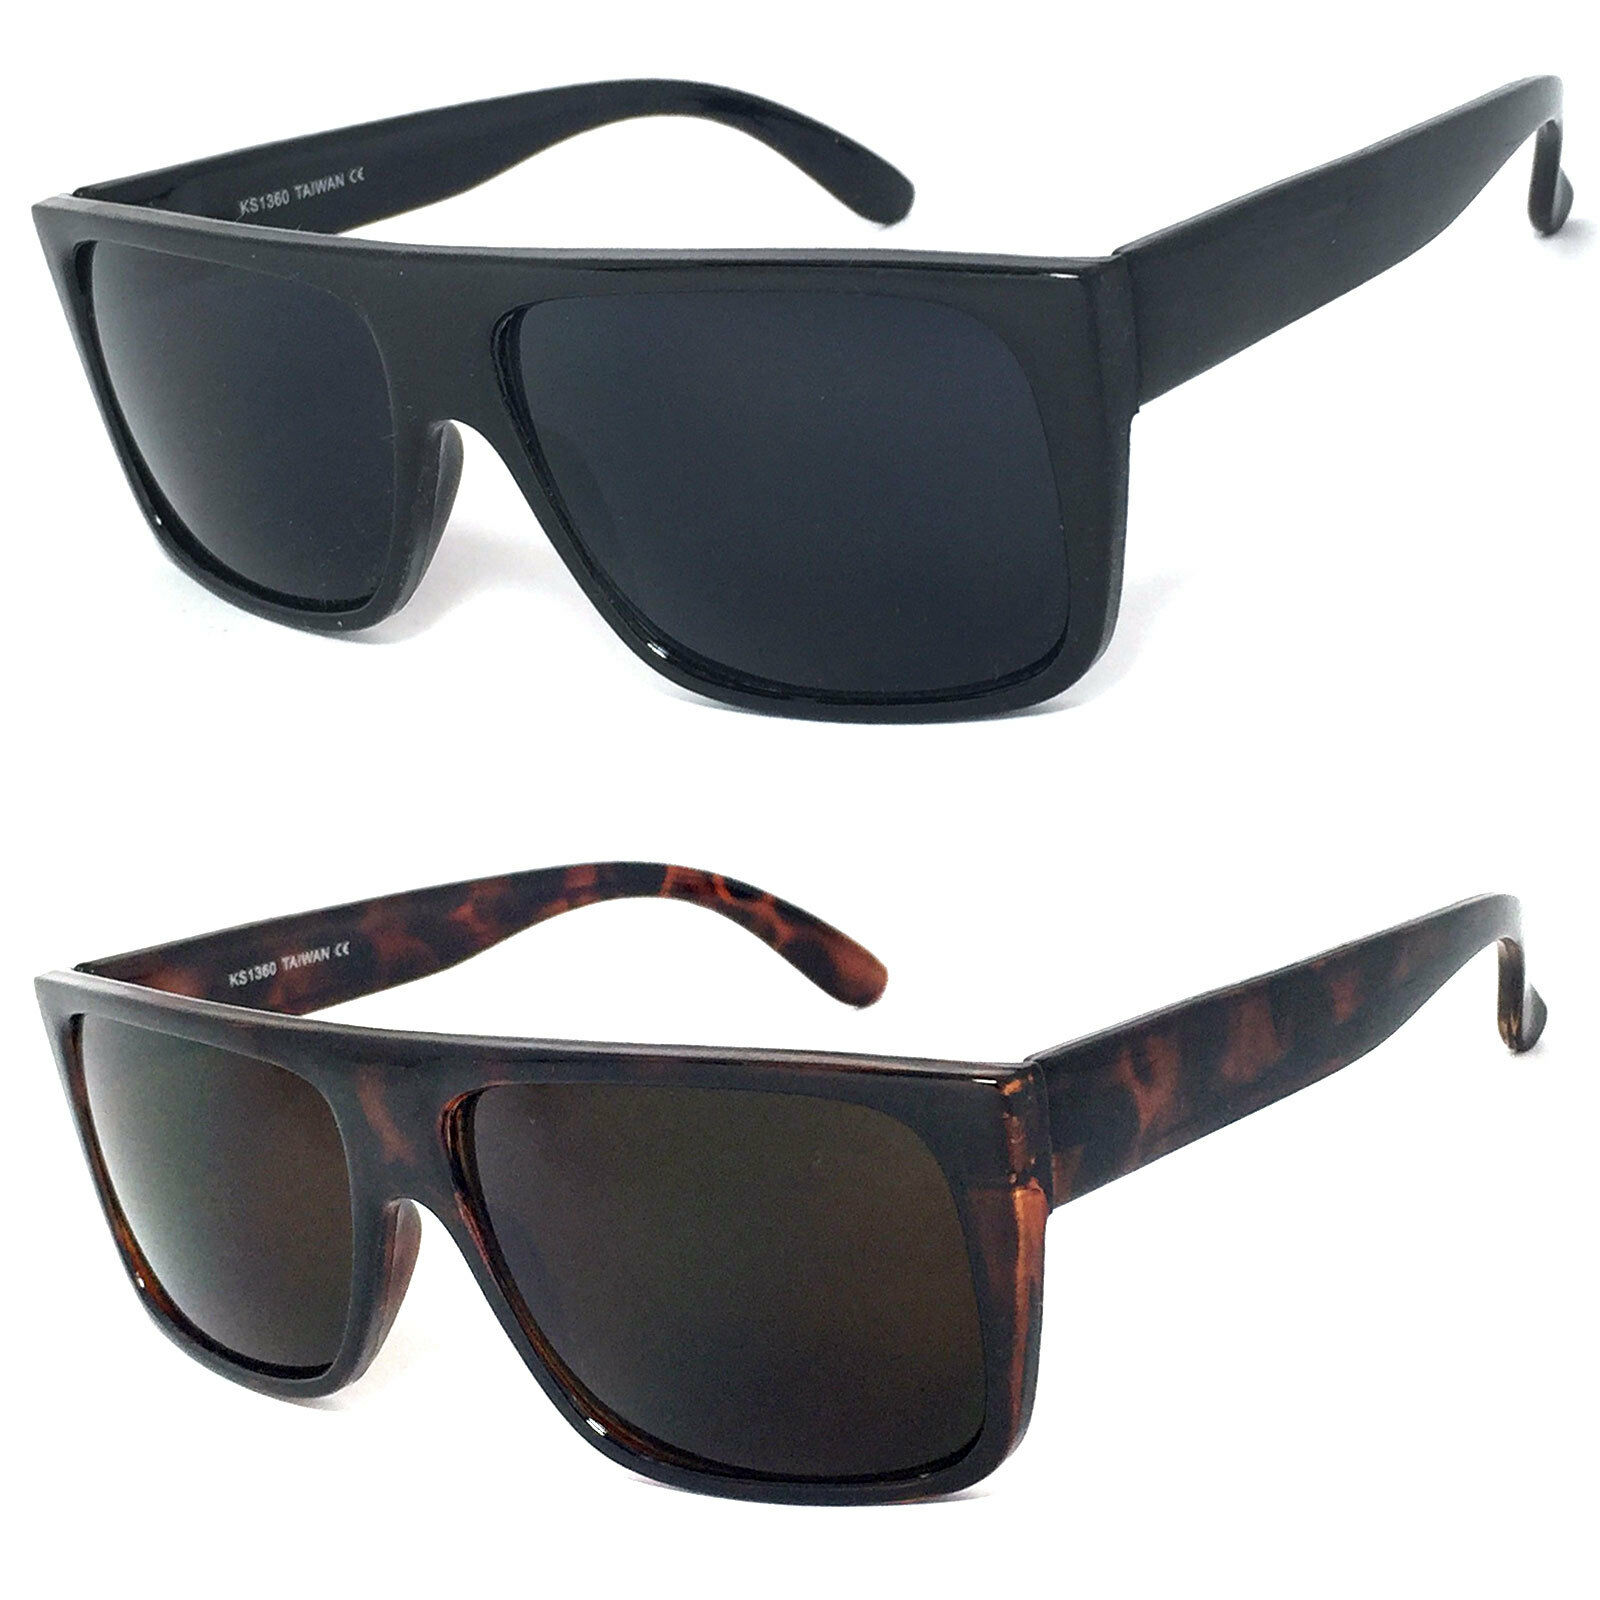 17906d44dc0 Details about Retro Square Frame Sunglasses Mens Womens Flat Top Square  Super Dark Lens